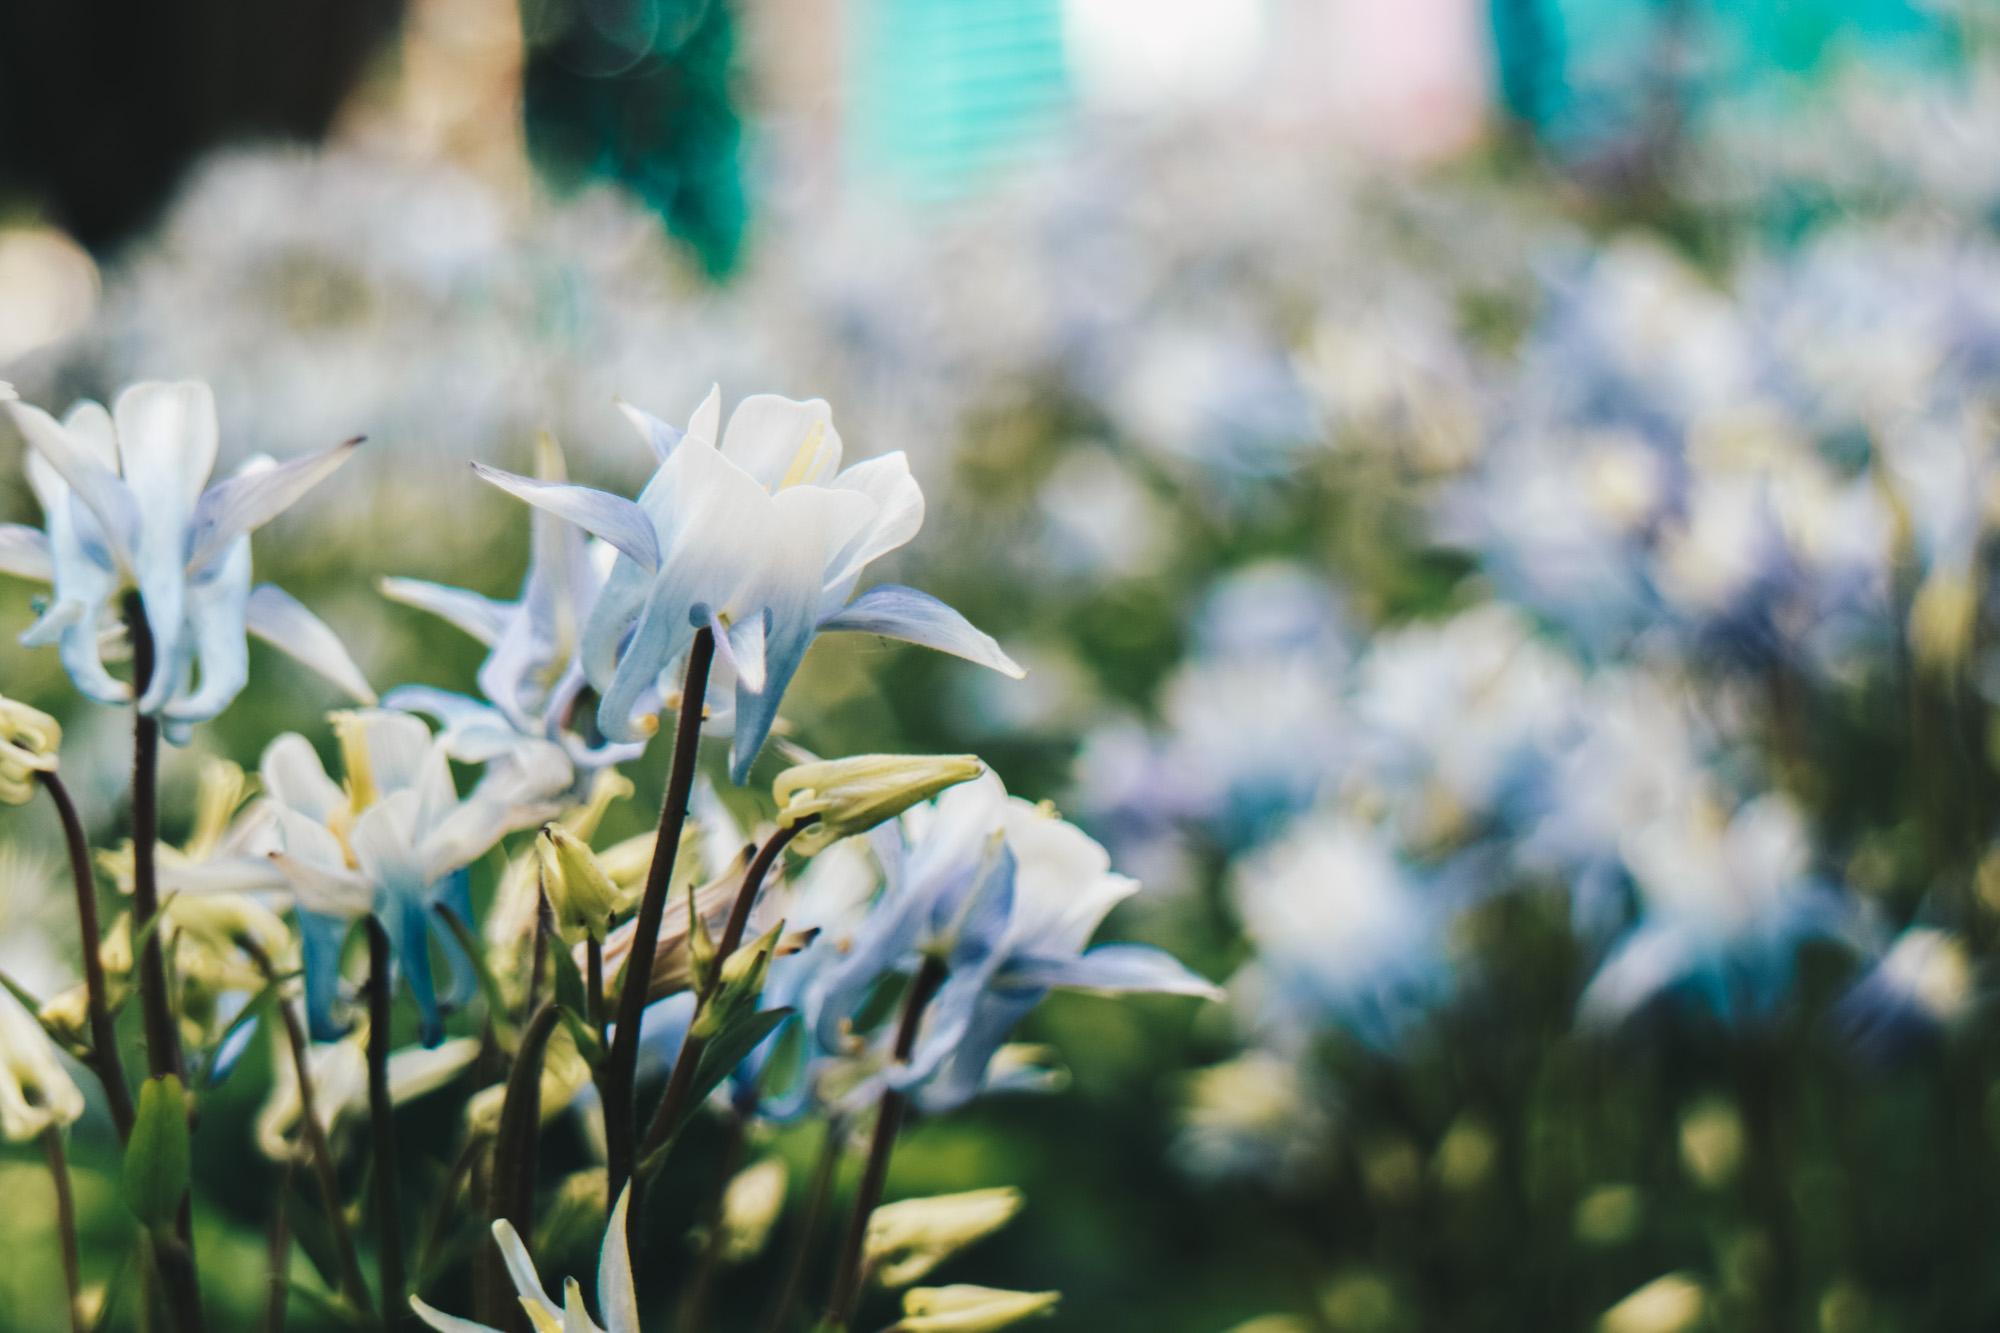 Blue-beauties-floral-display-gardensbythebay-darrenbloggie3